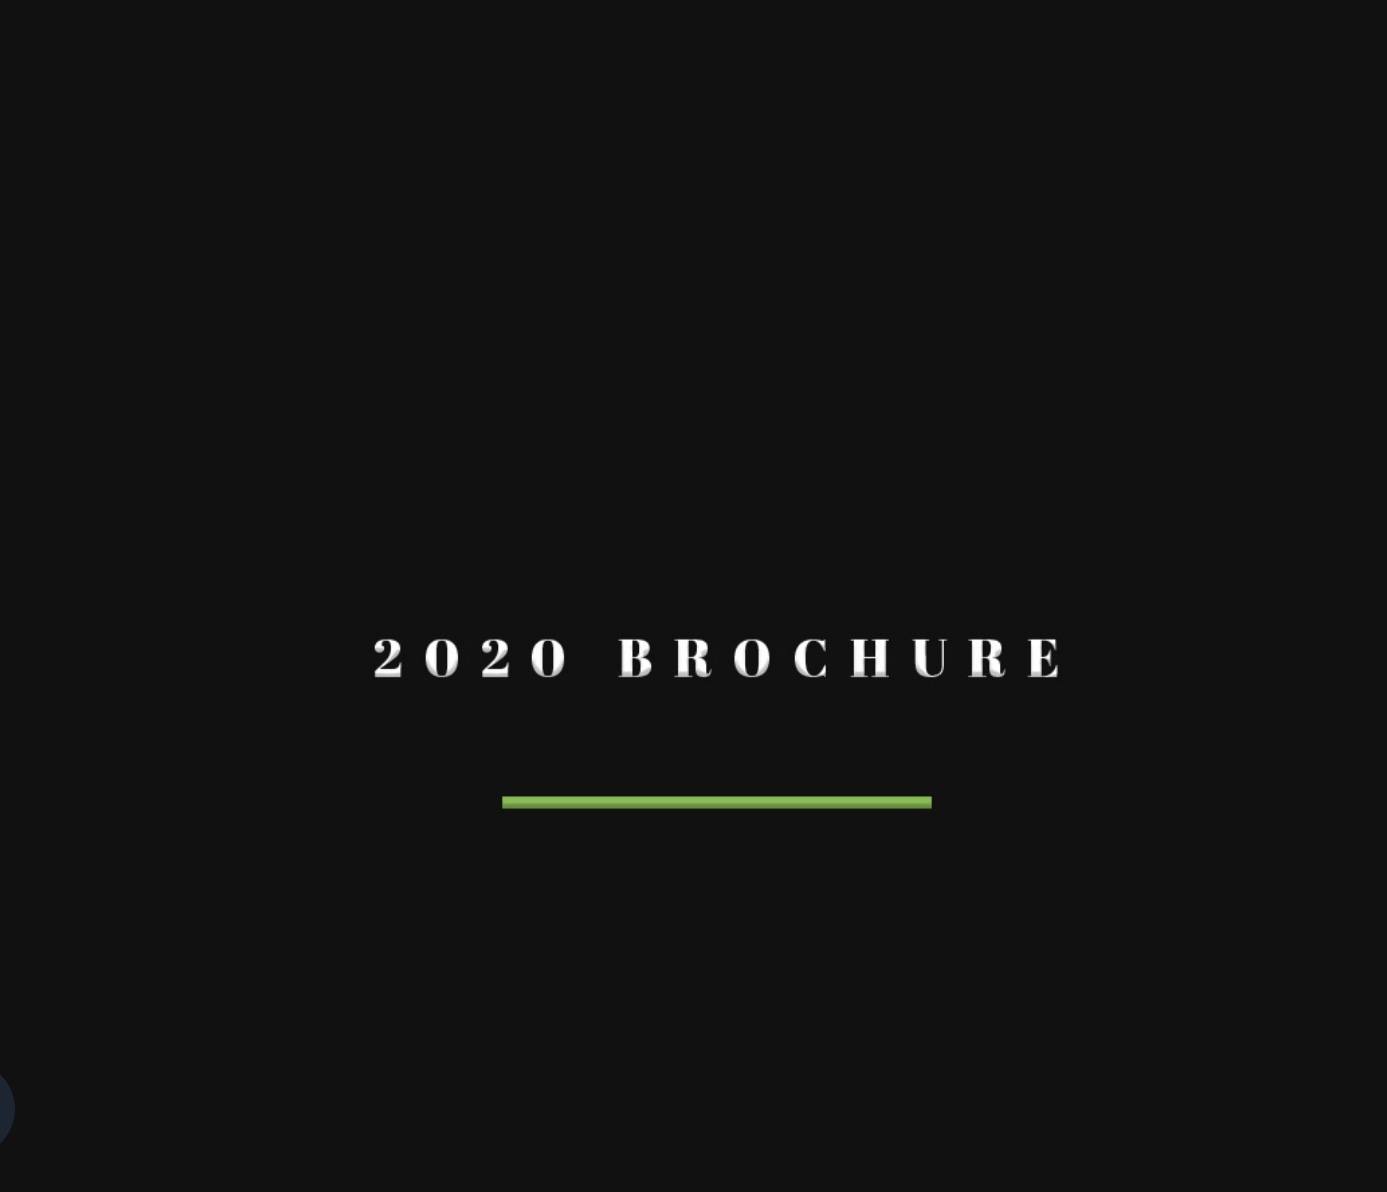 Brochure 2020 Golf-lahjat